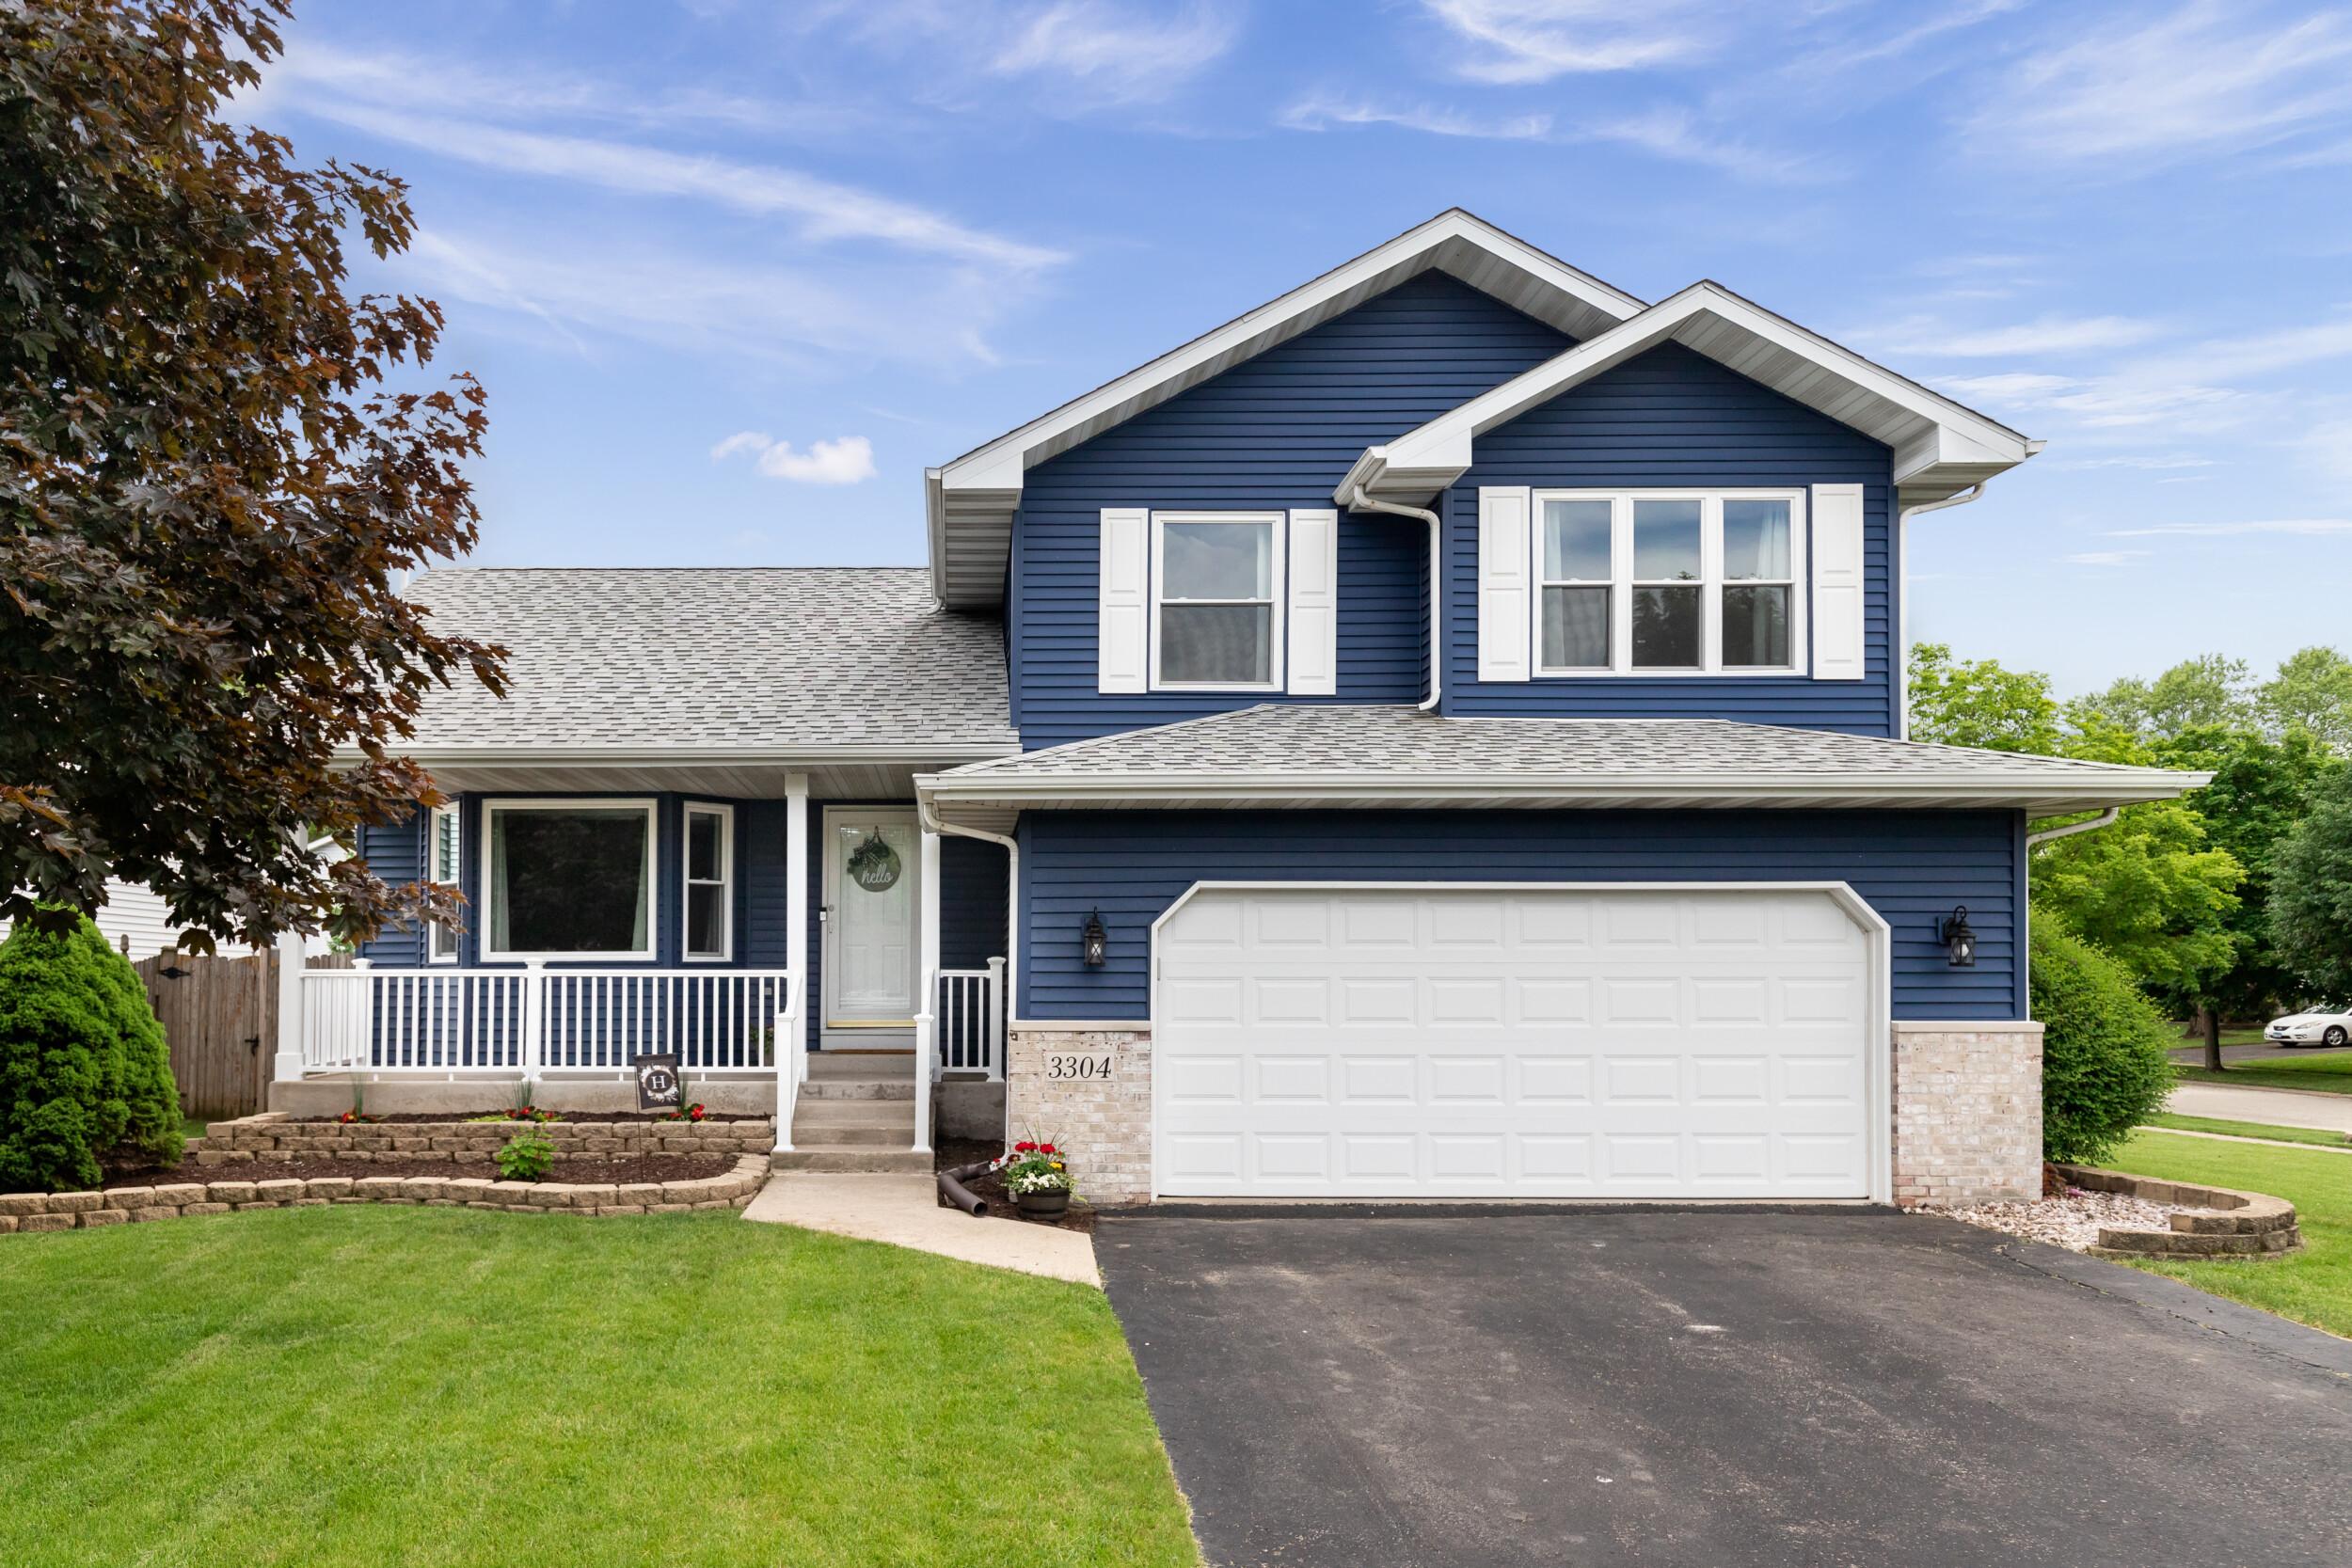 house exterior dark blue and white